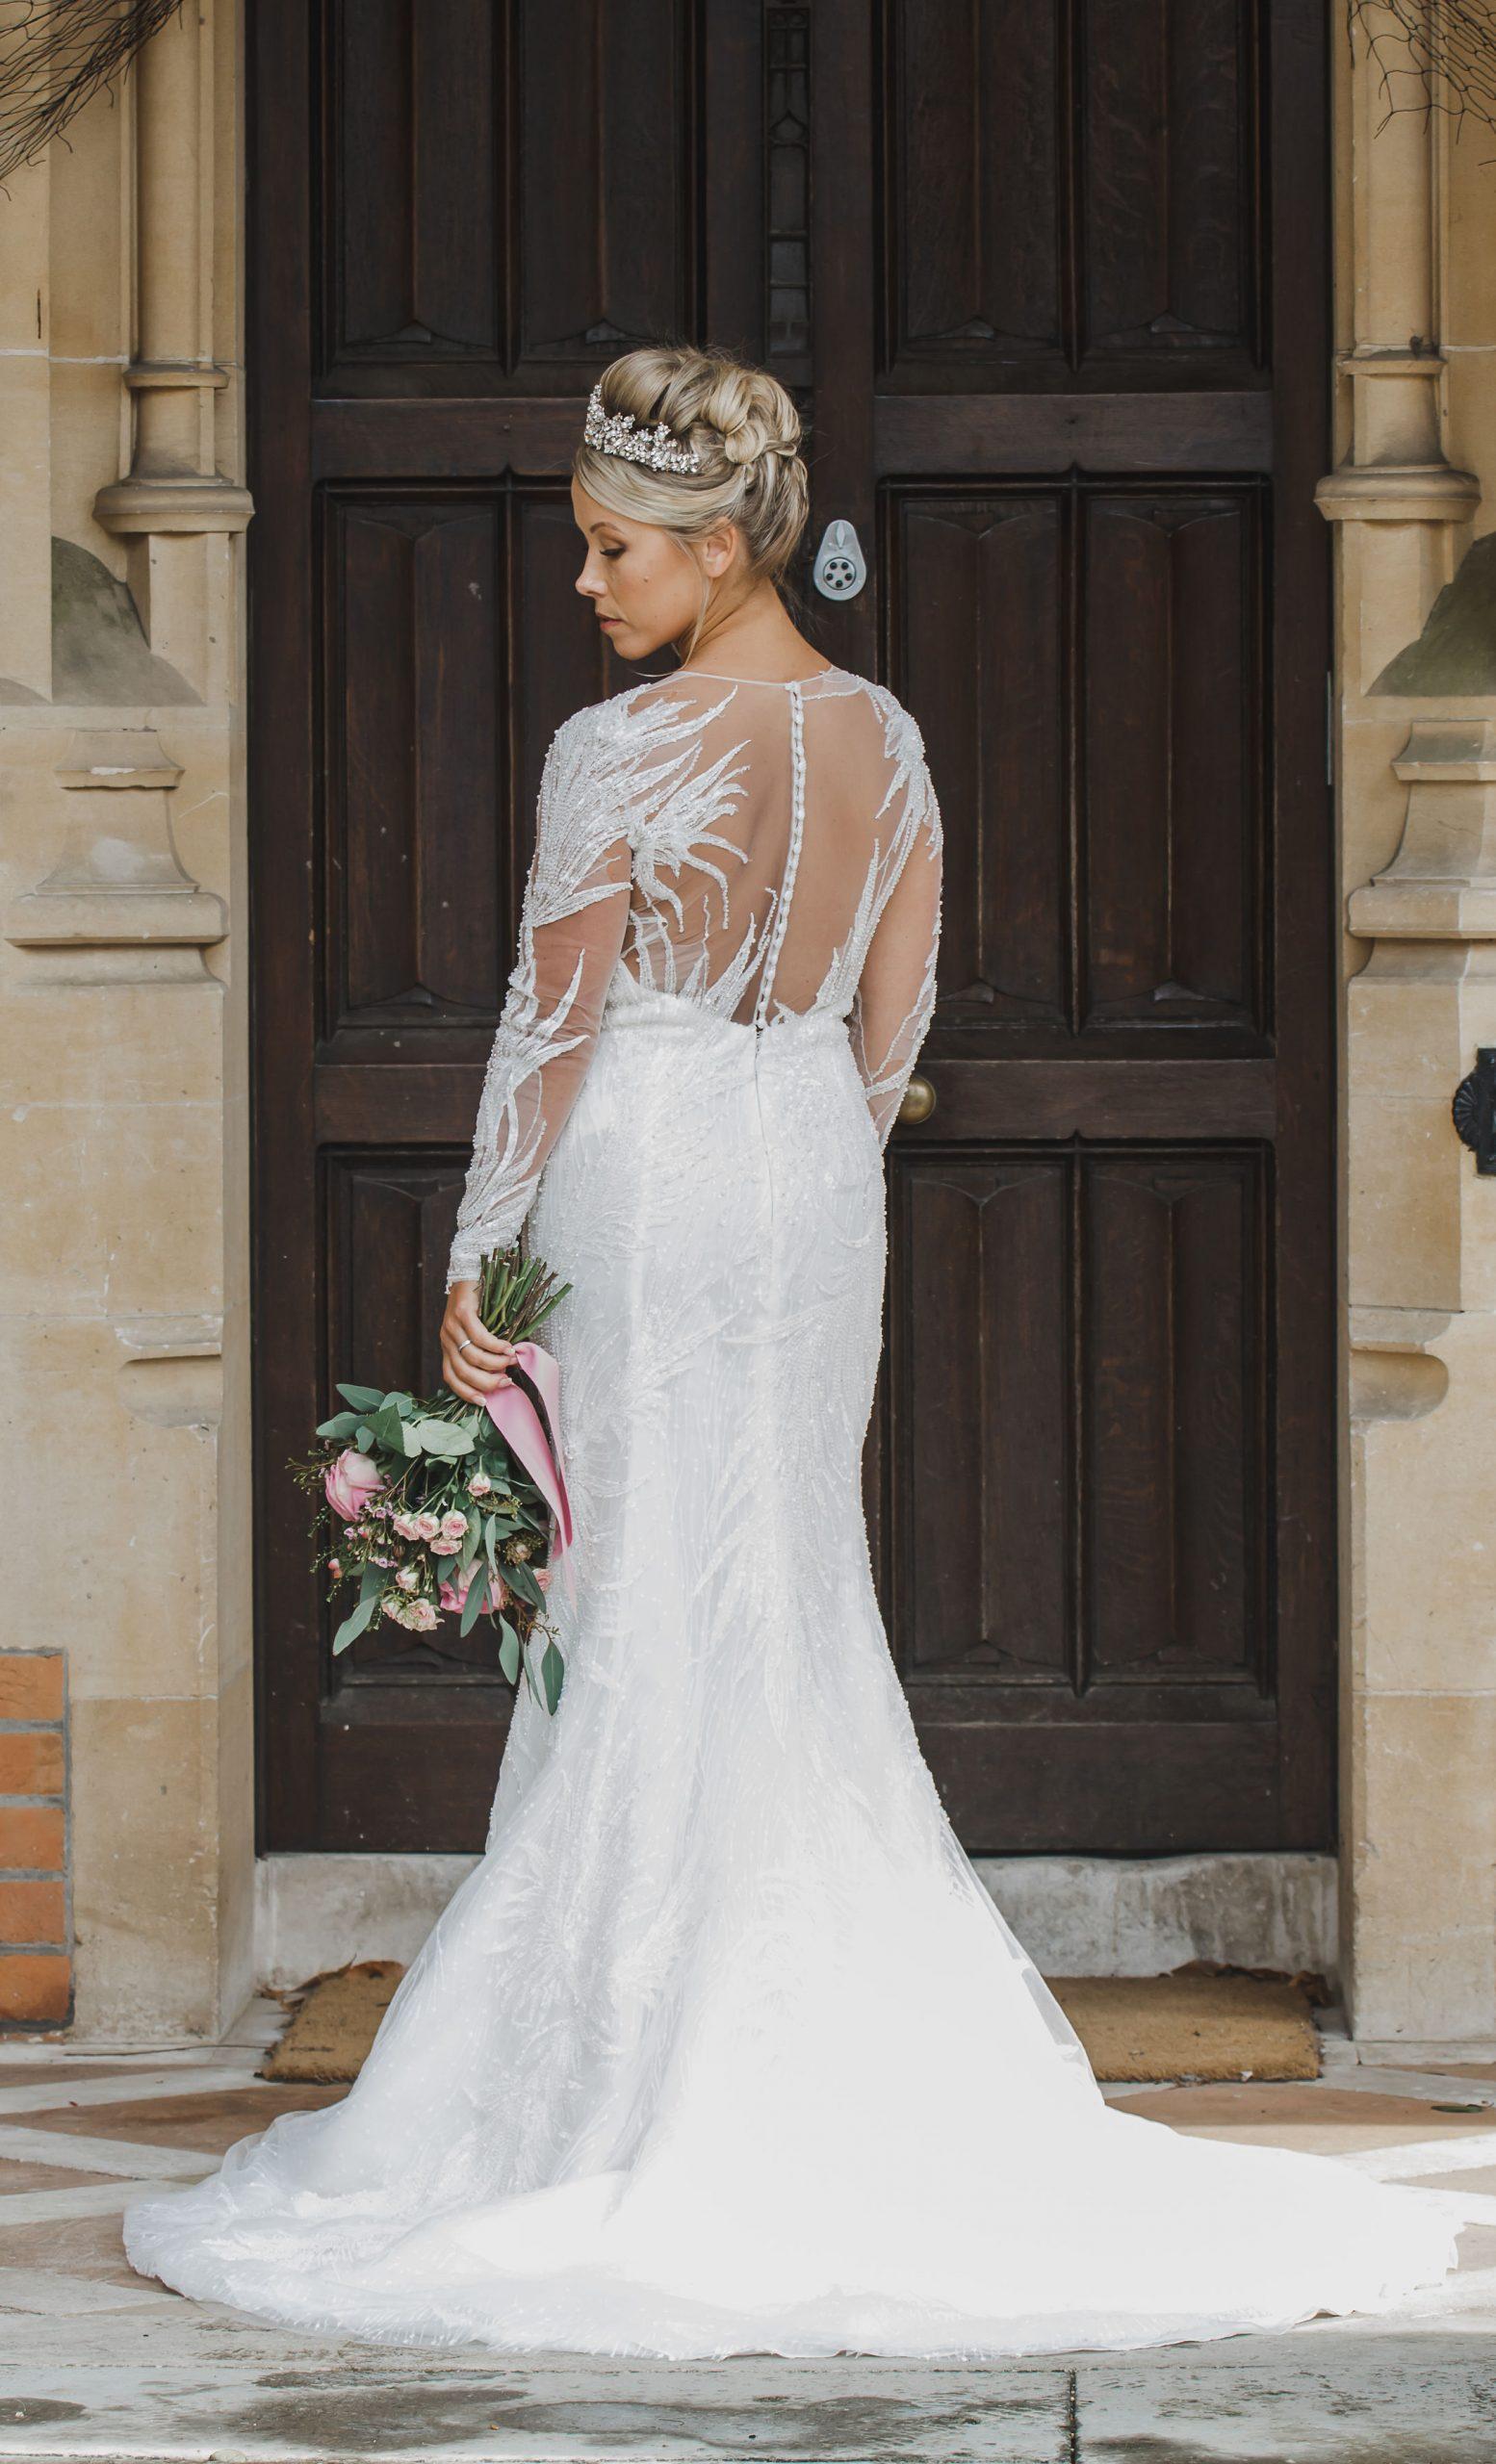 Bridal Gown Inspiration | Flamboyant Invites